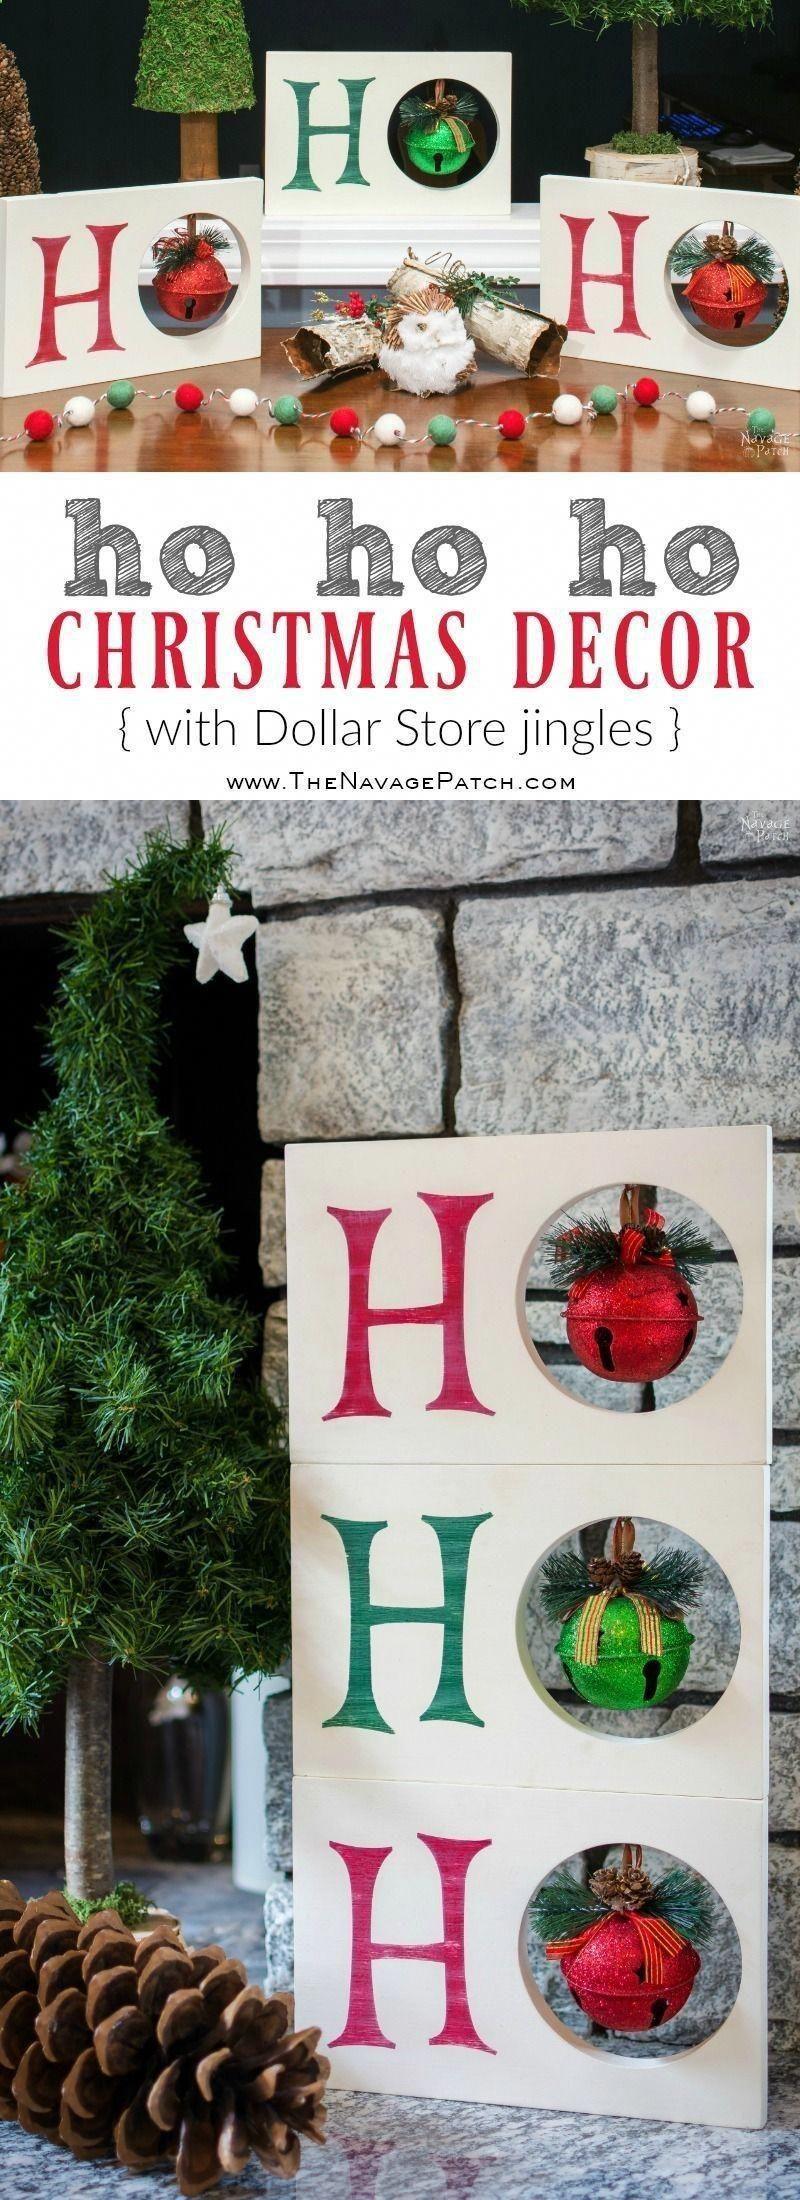 Wedding decorations for home december 2018 Diy Christmas decoration  HO HO HO Christmas decor  Dollar Store